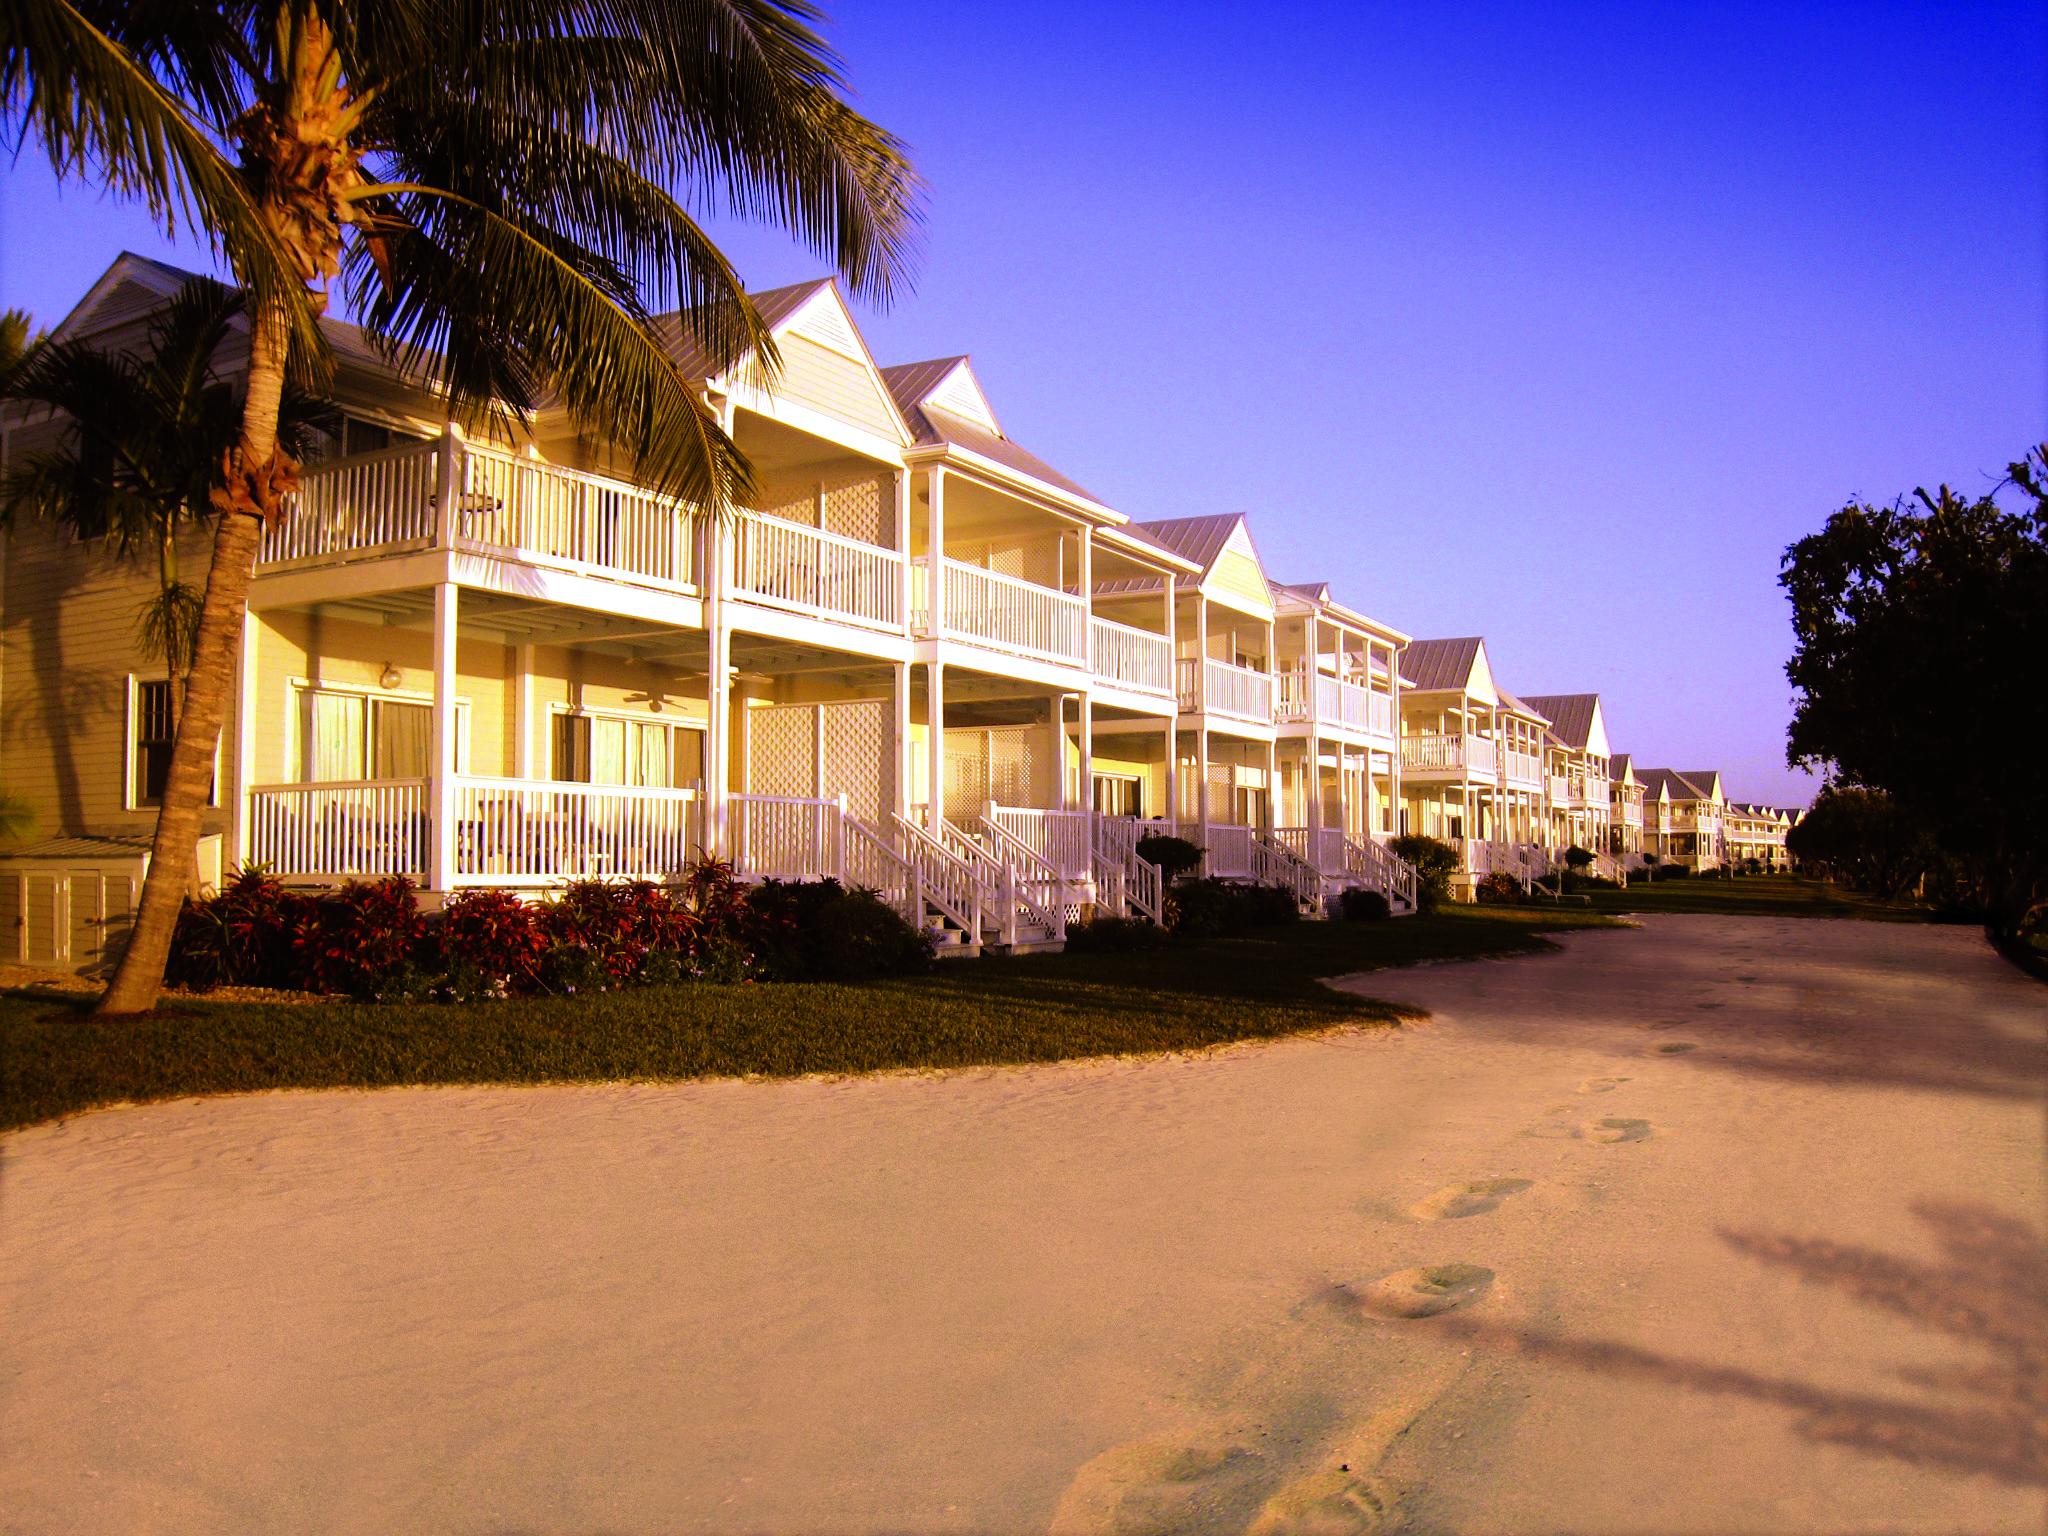 Village Of Hawks Cay Sunset Villas By Coco Plum